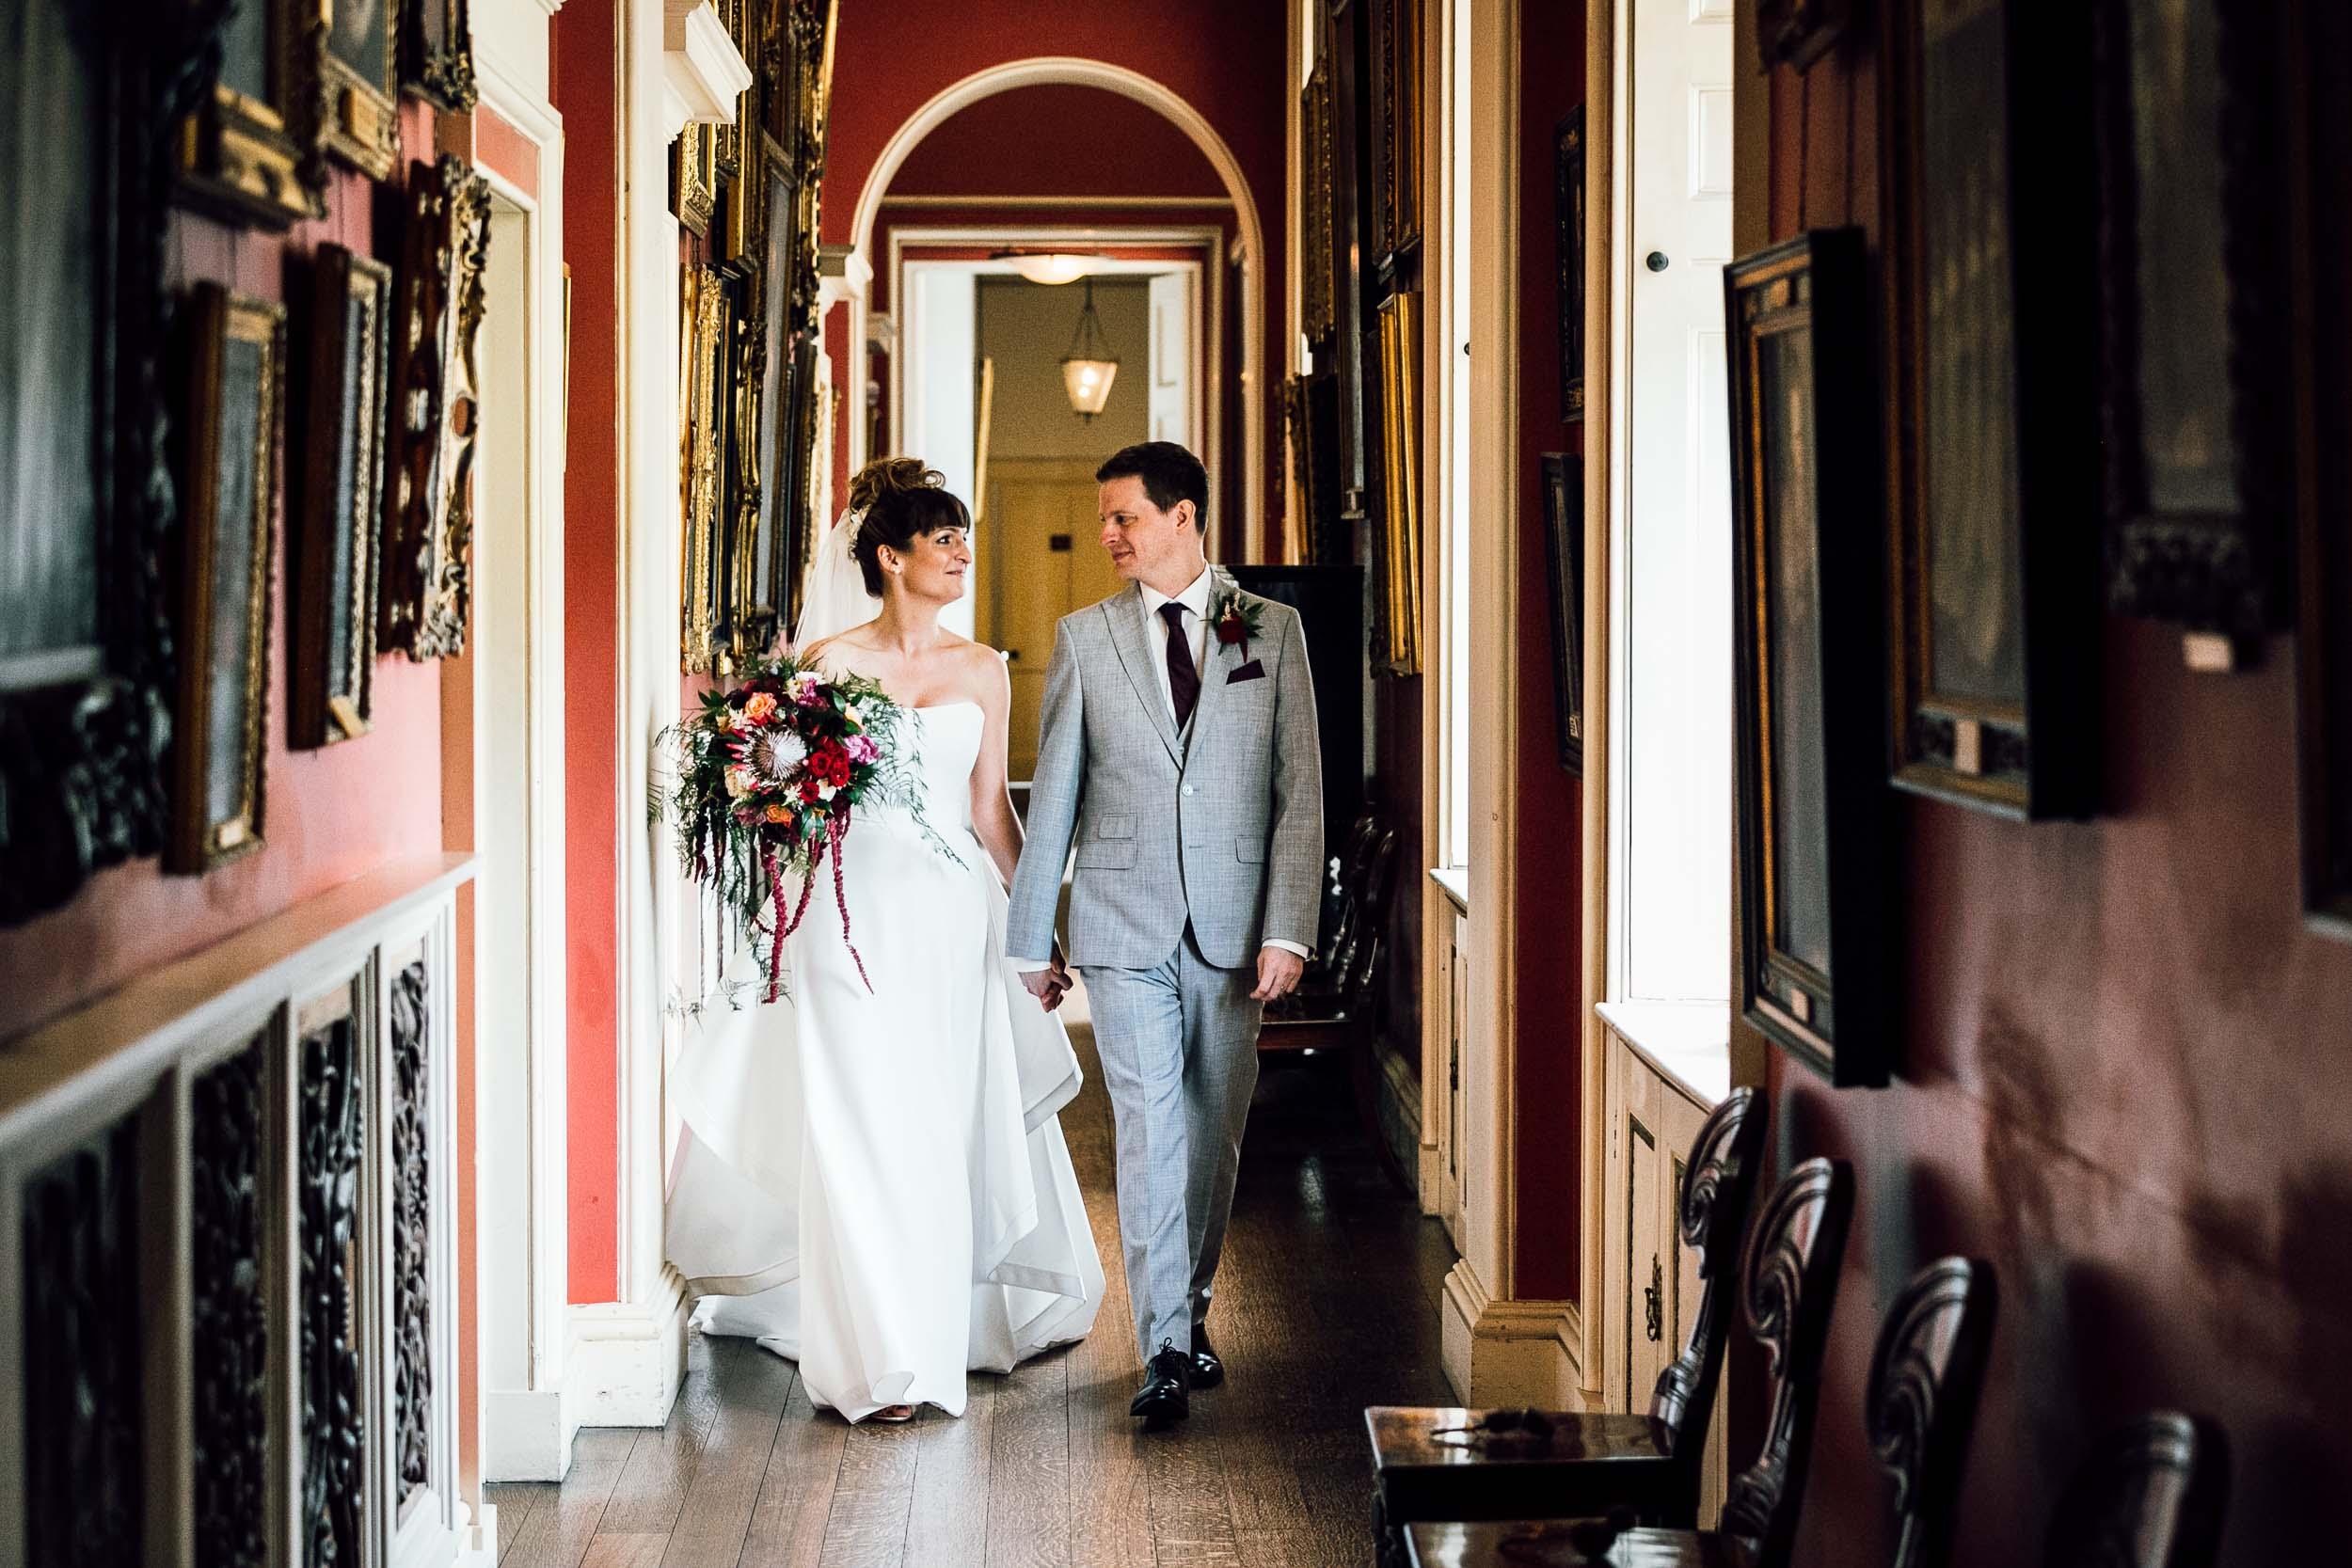 syon-house-wedding-photographer-london 074.jpg